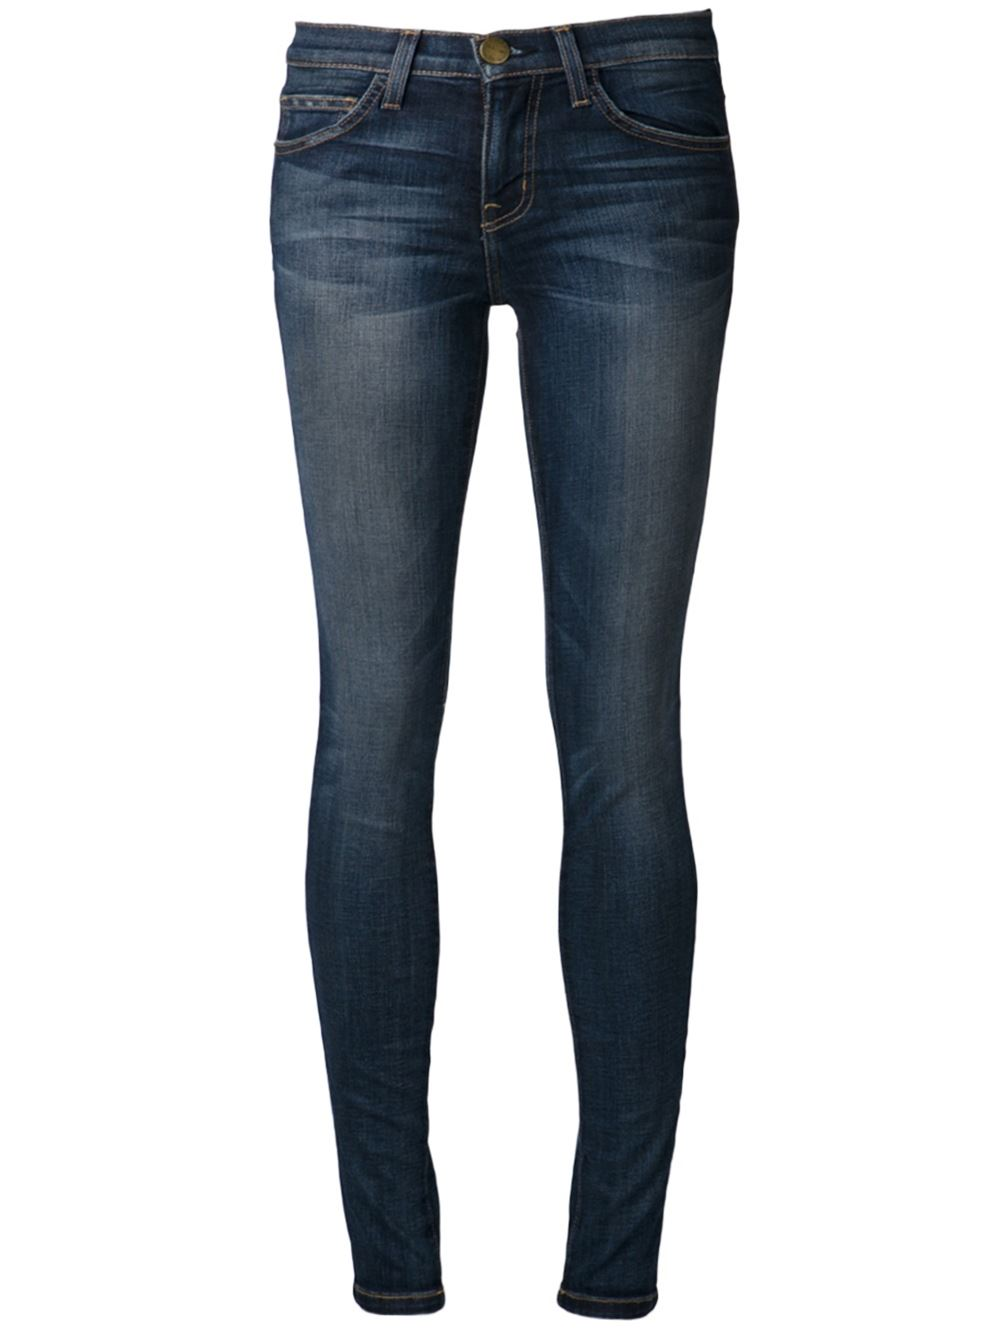 Current/elliott 'the high waist' jeans